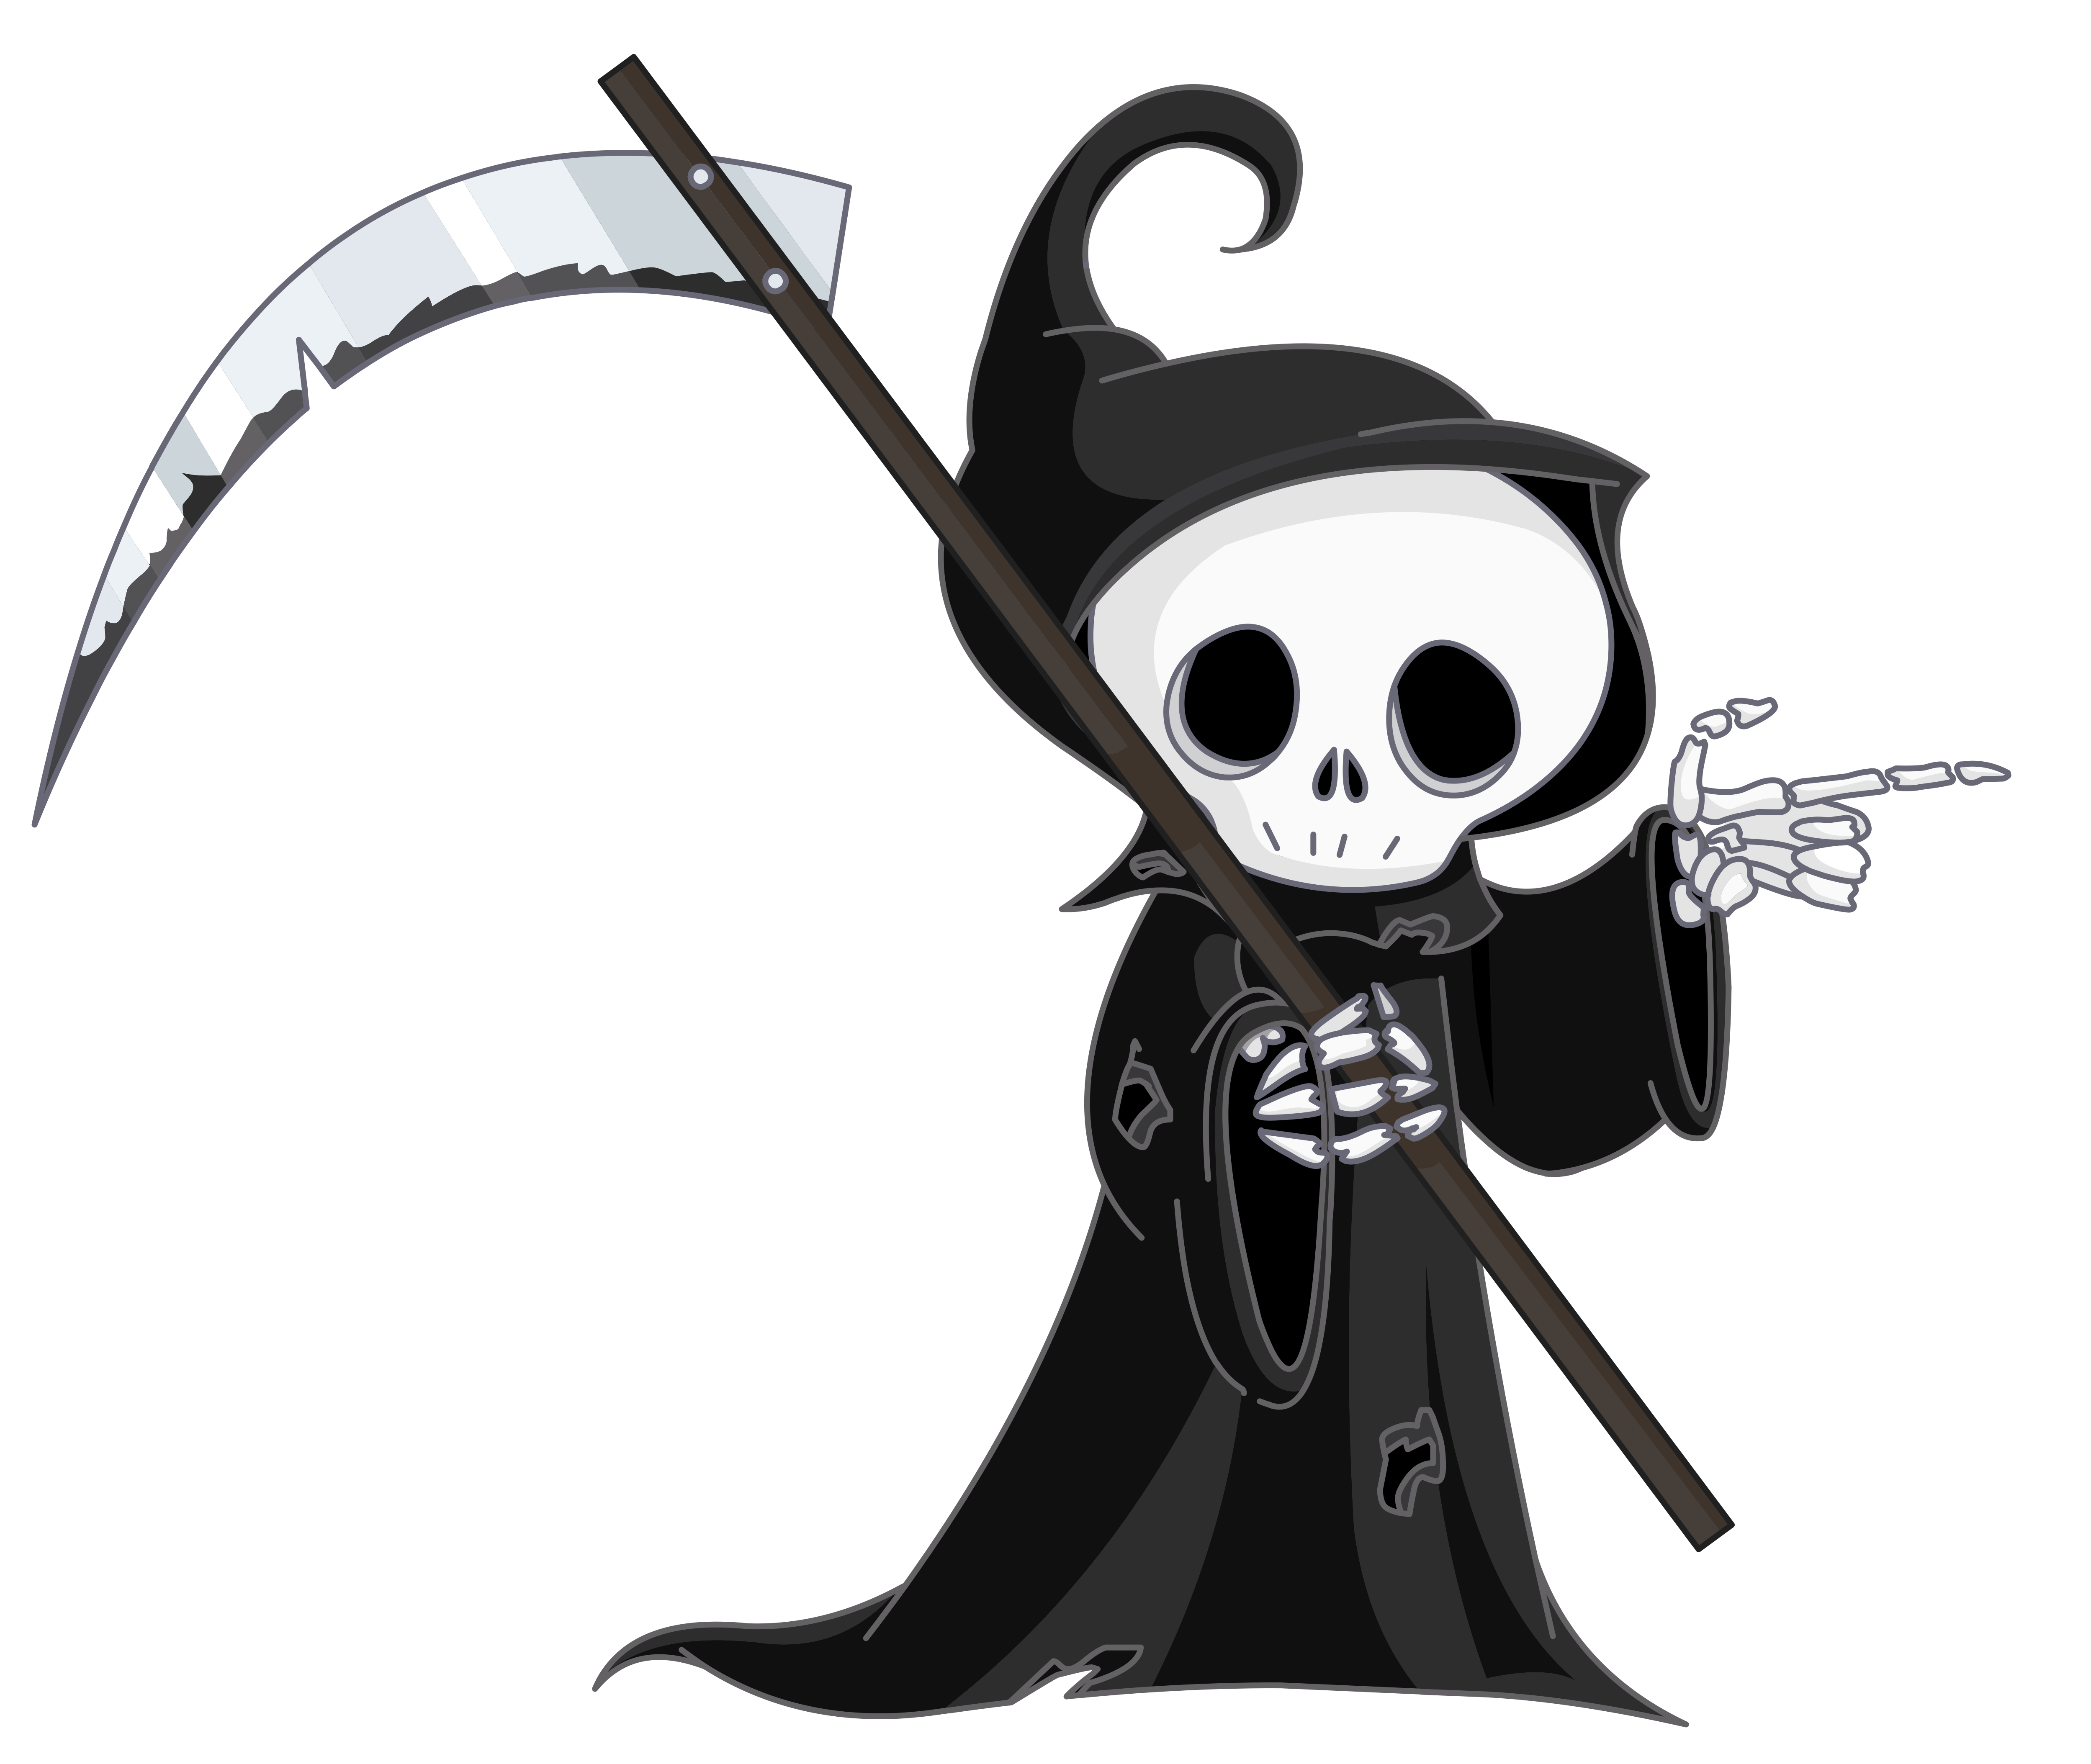 Images of Grim Reaper | 4995x4215